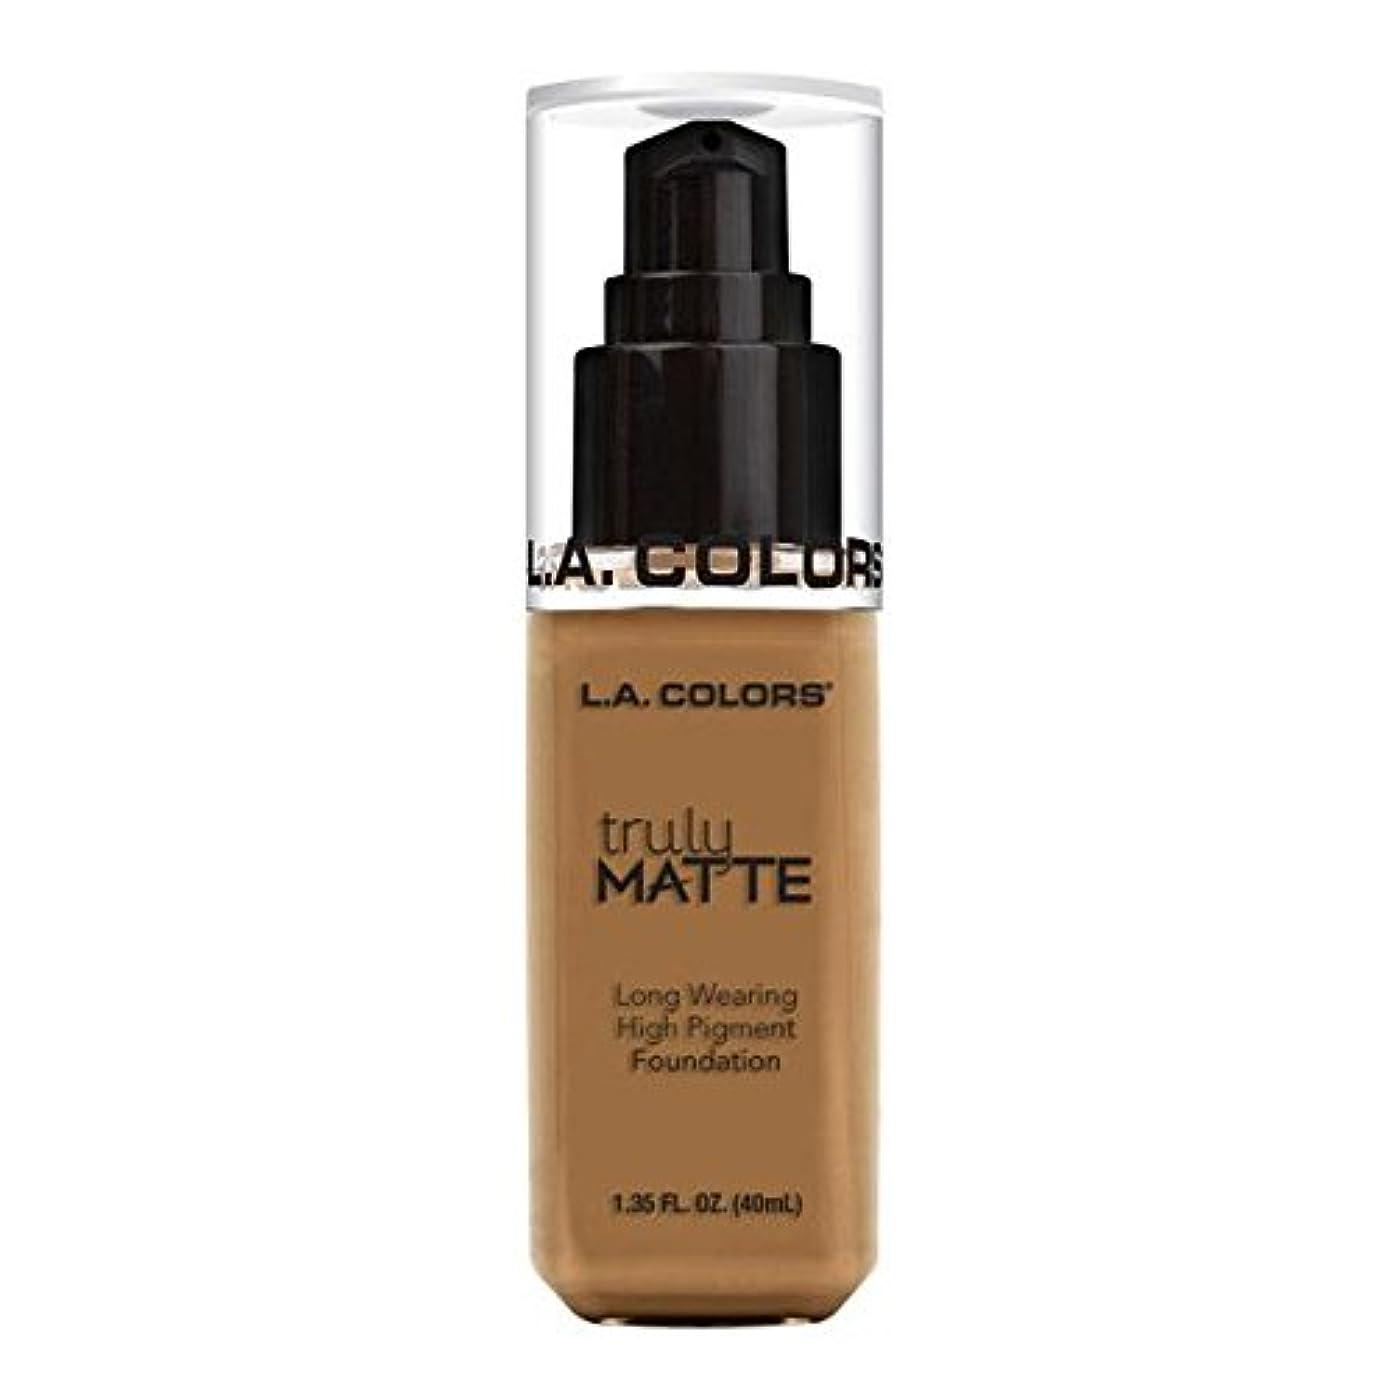 (6 Pack) L.A. COLORS Truly Matte Foundation - Warm Caramel (並行輸入品)